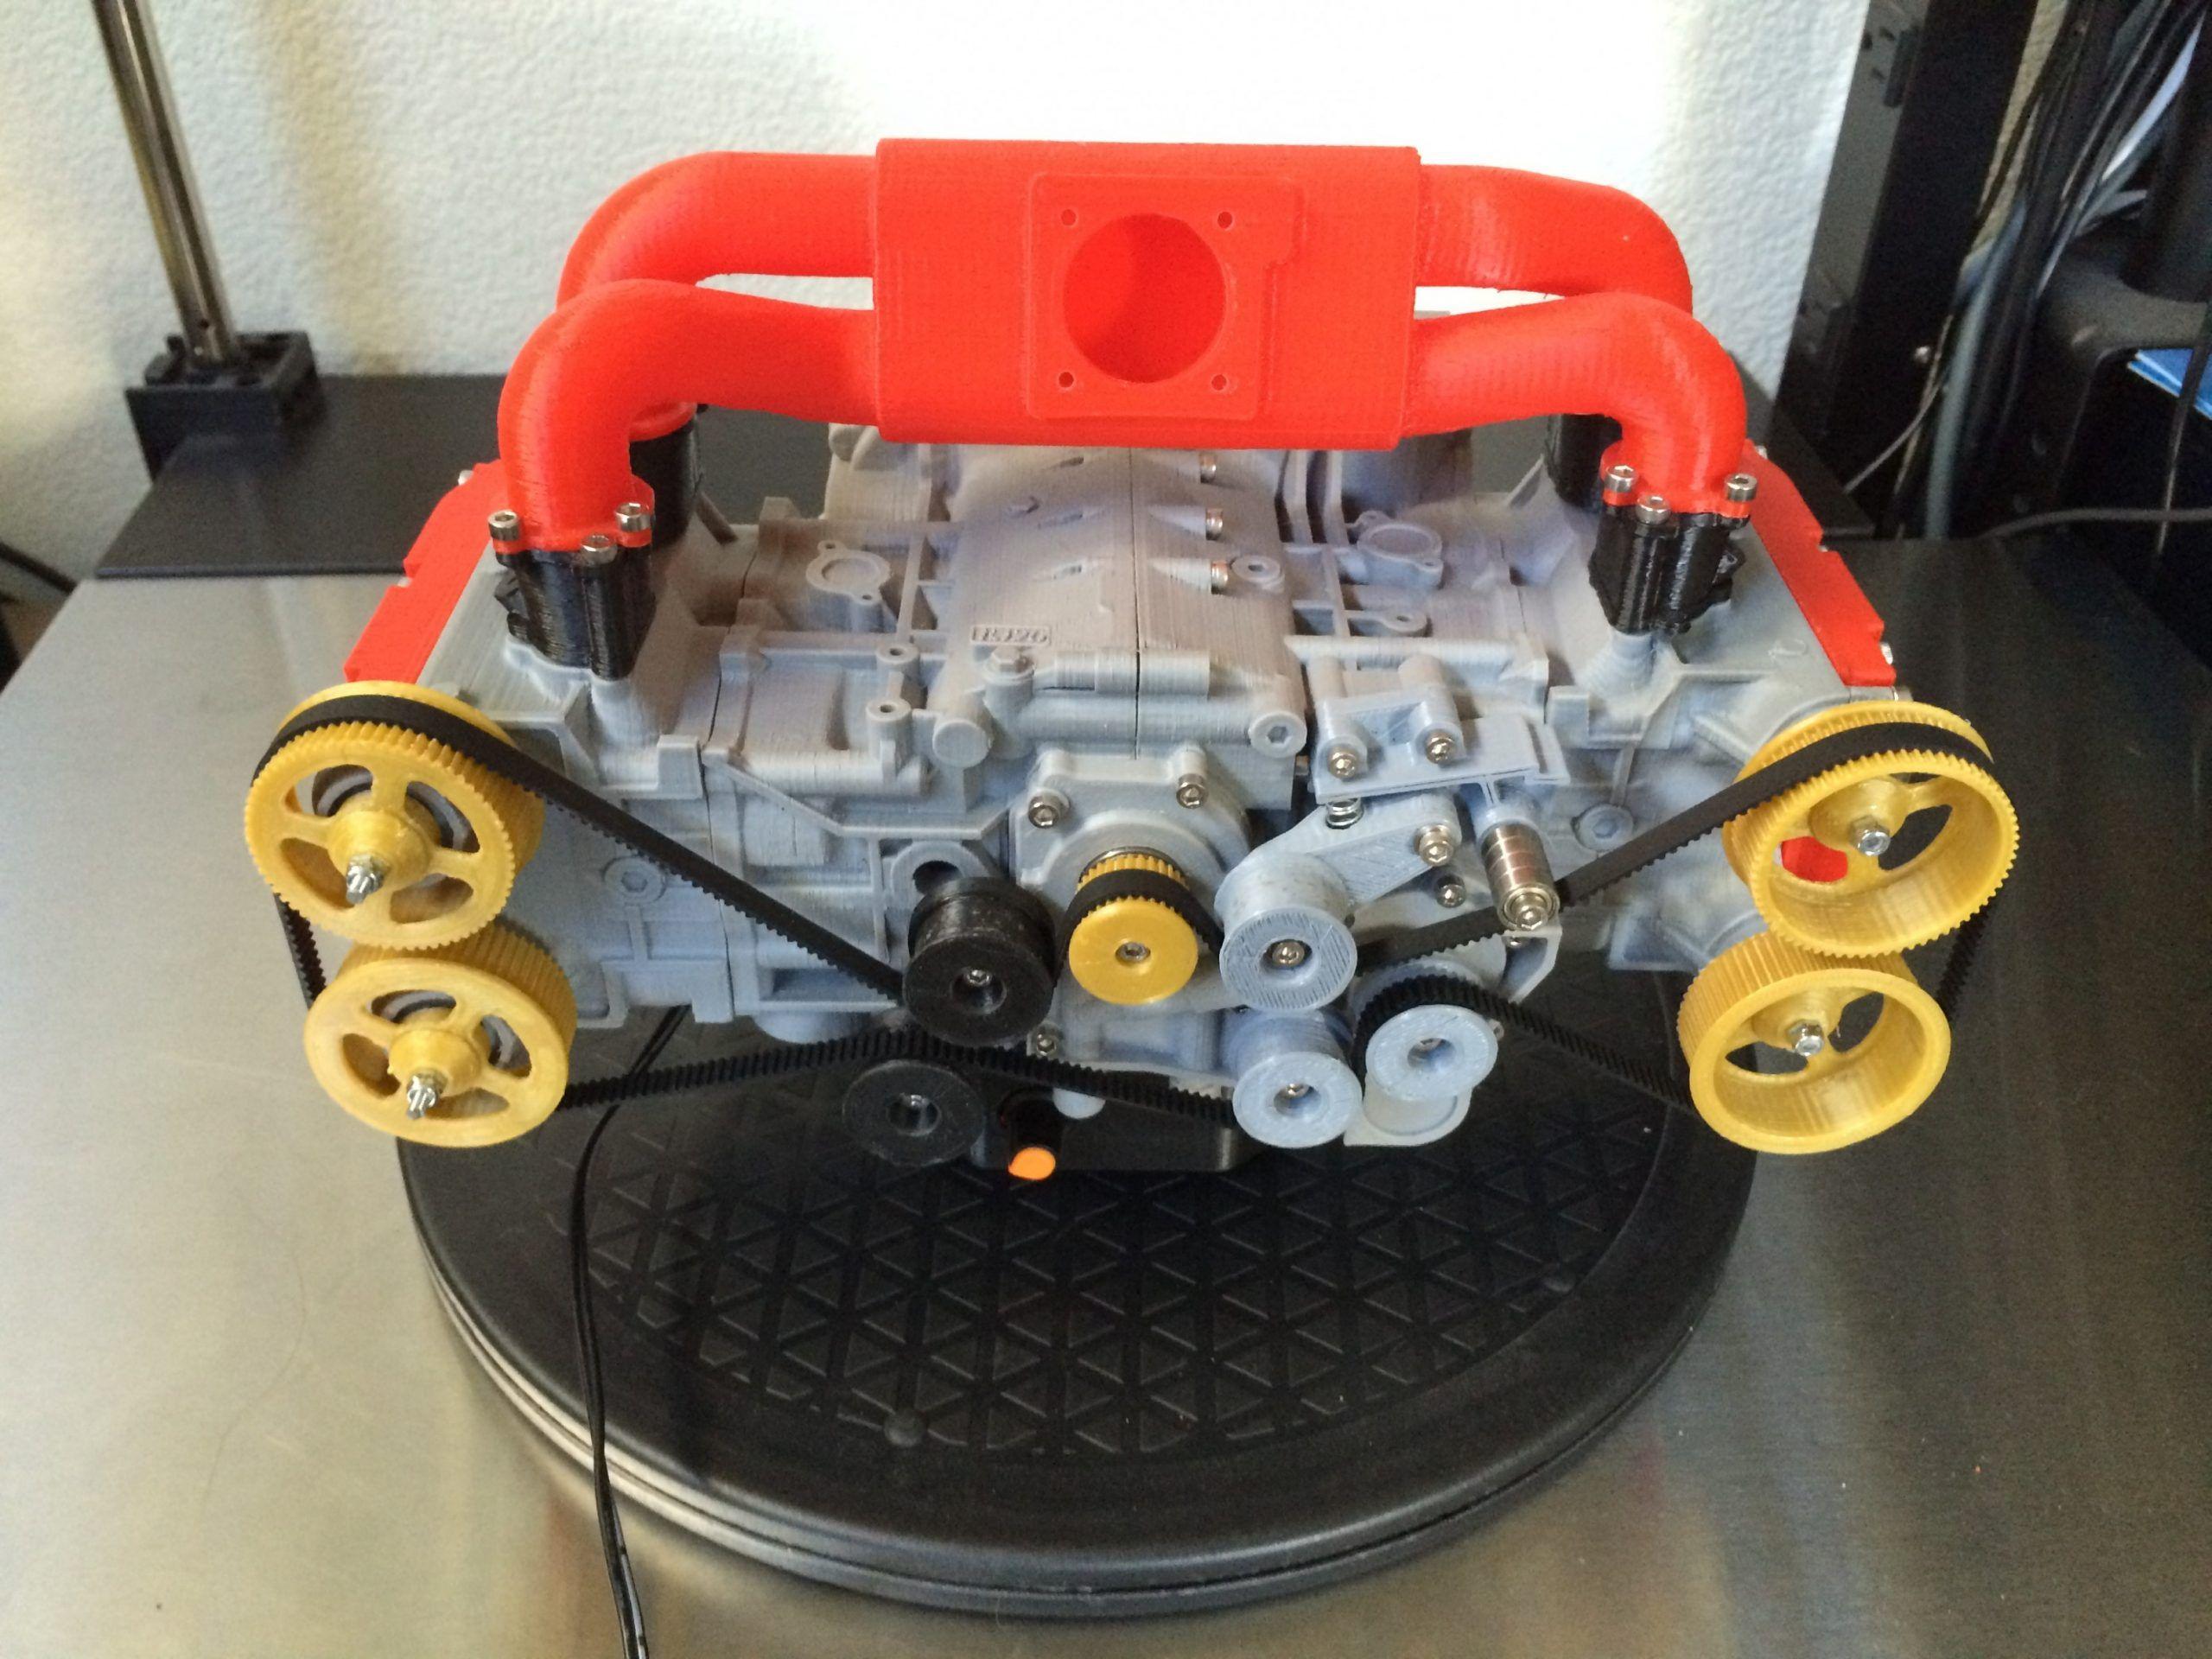 Subaru Boxer Engine Diagram | Modelos 3d, Modelos, IdeiasPinterest